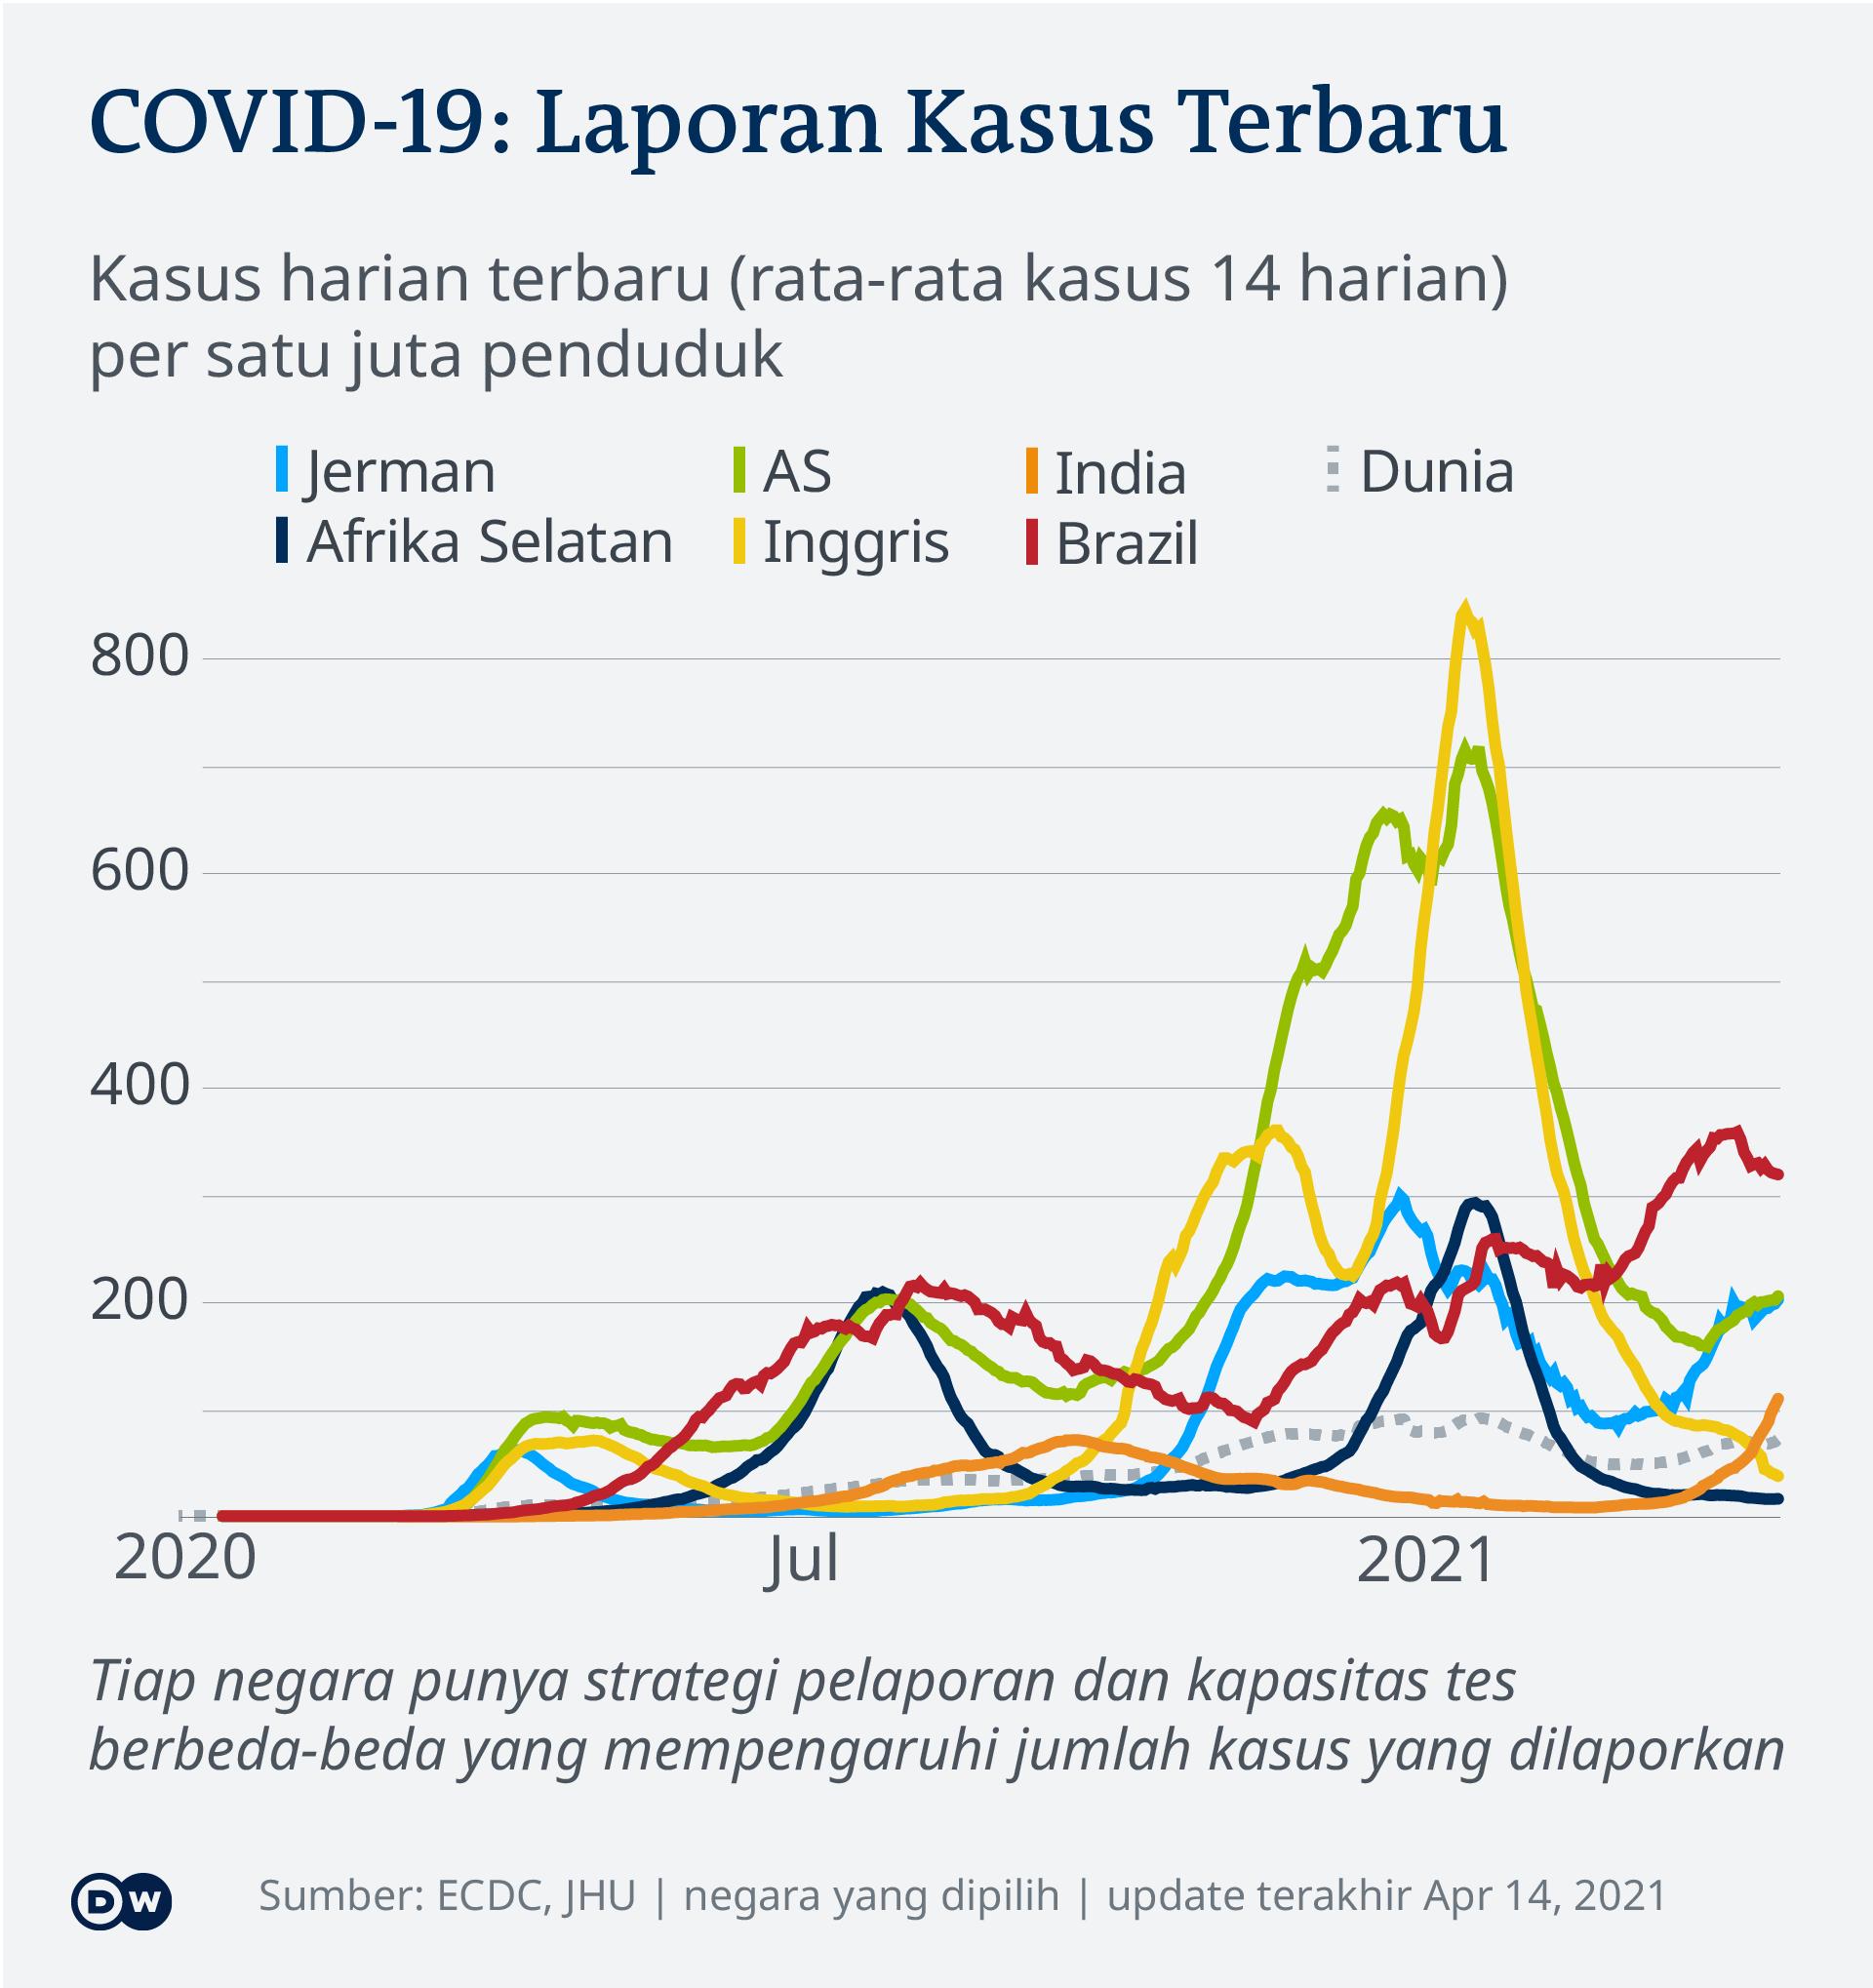 Data kasus harian terbaru COVID-19 di beberapa negara tiap satu juta penduduk